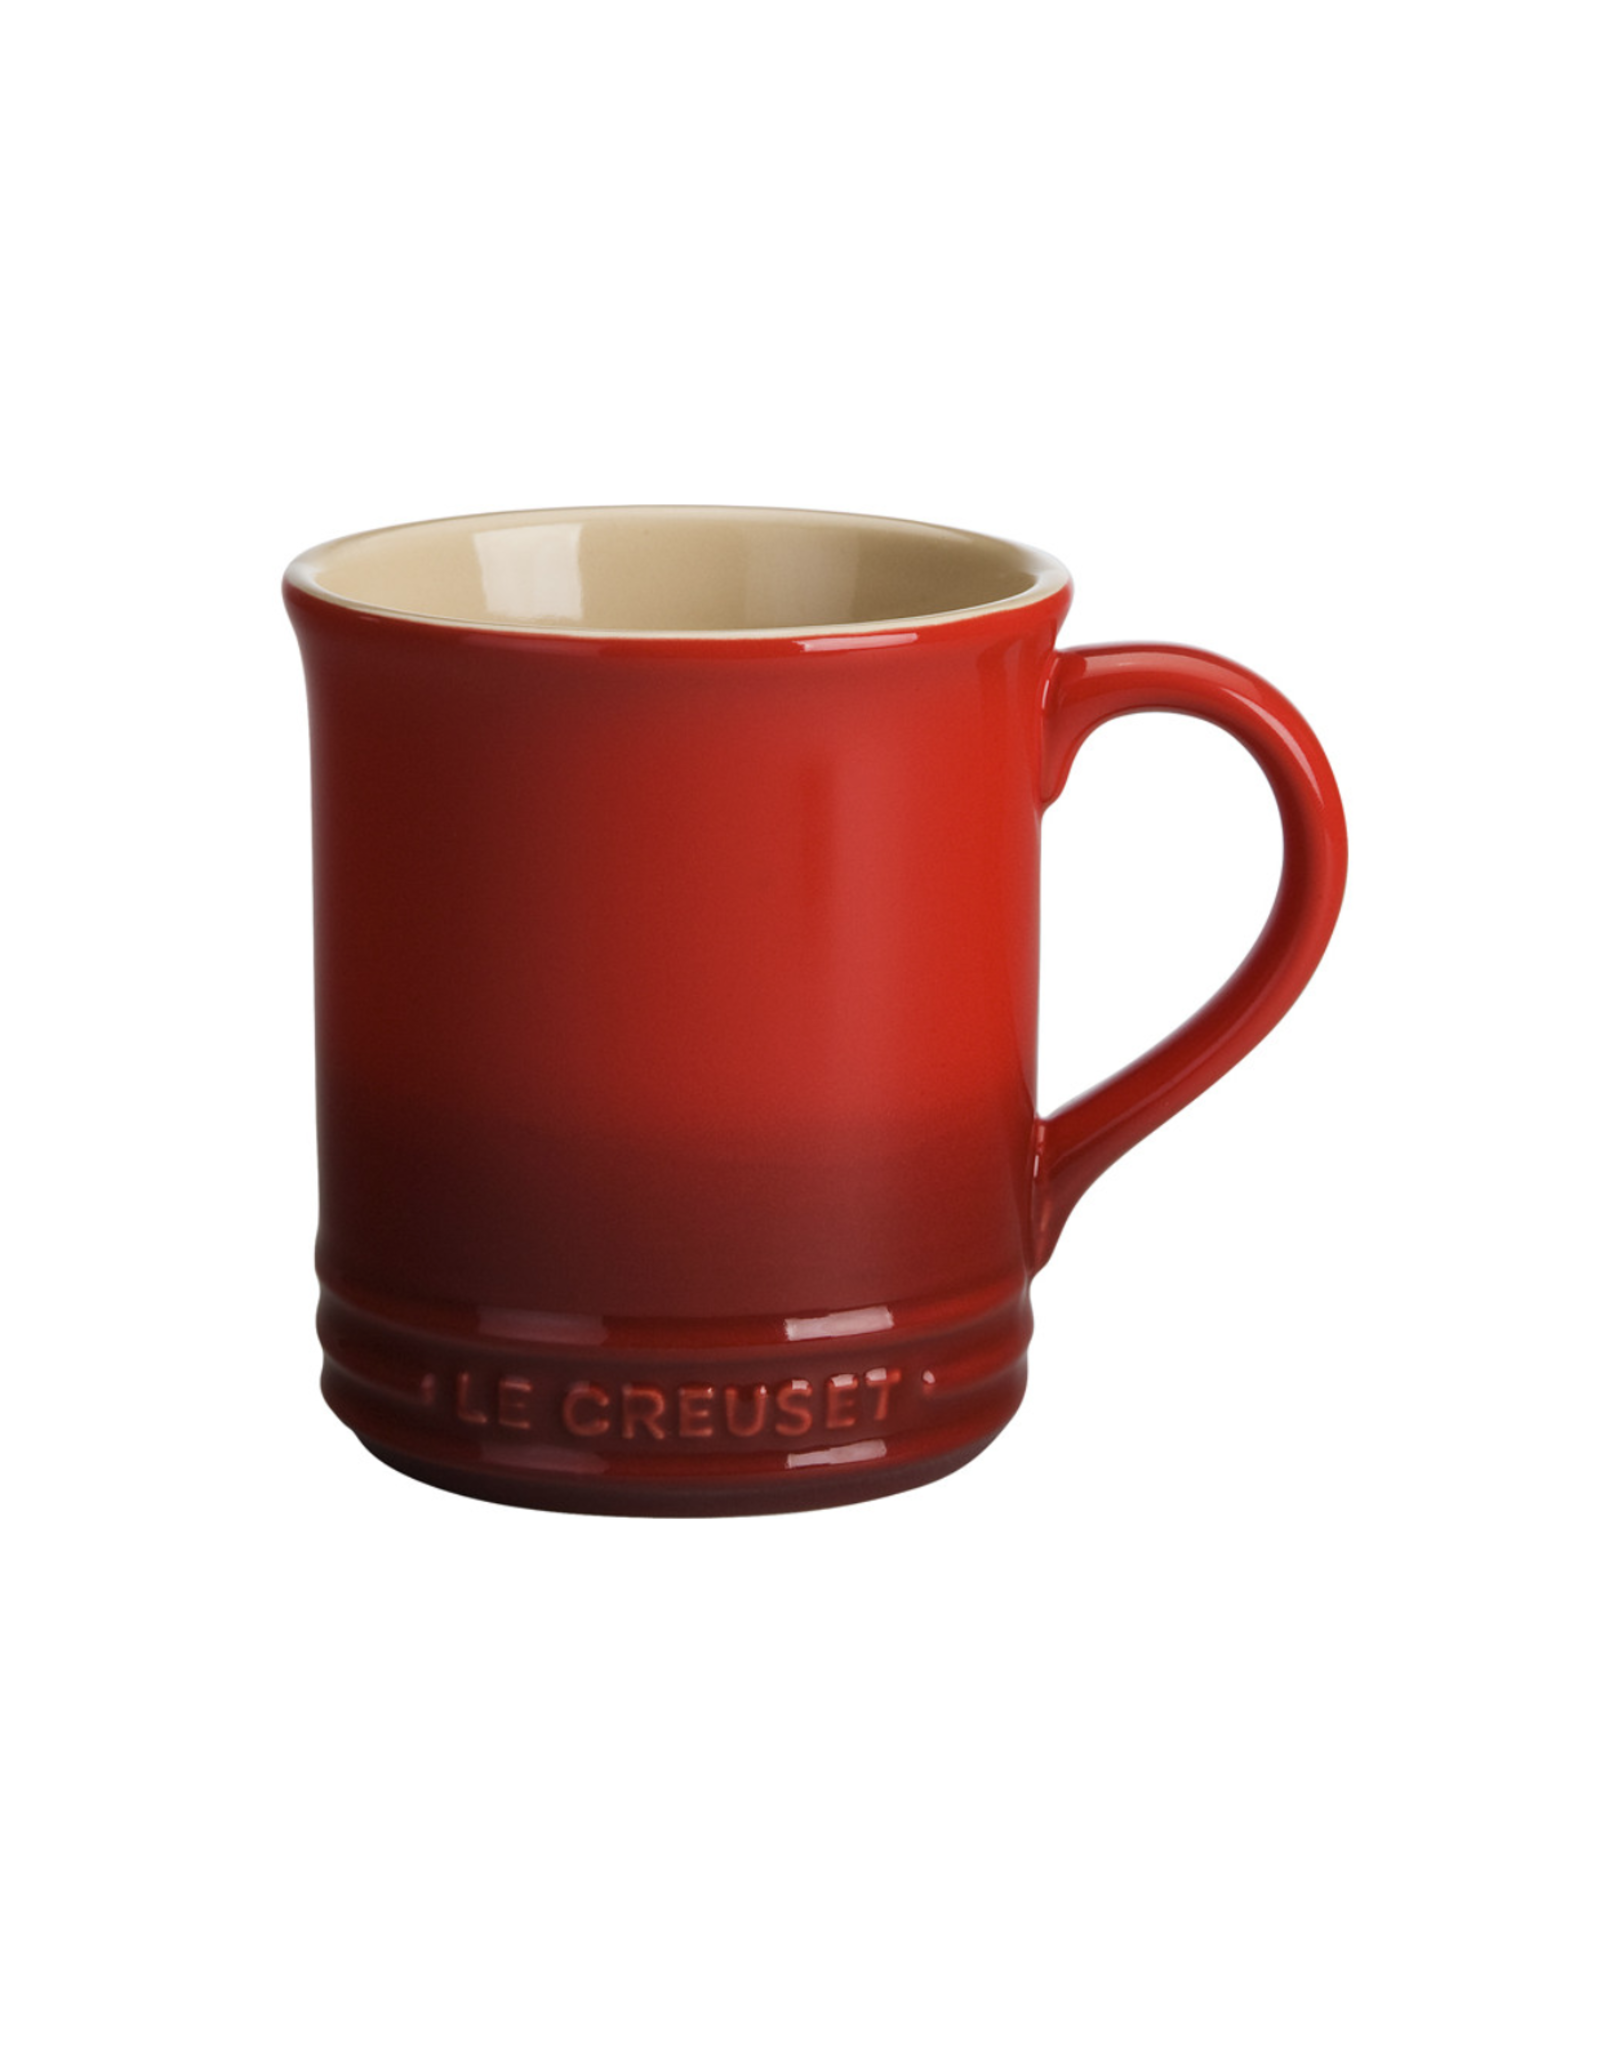 Le Creuset Stoneware Mug 12oz - Cerise